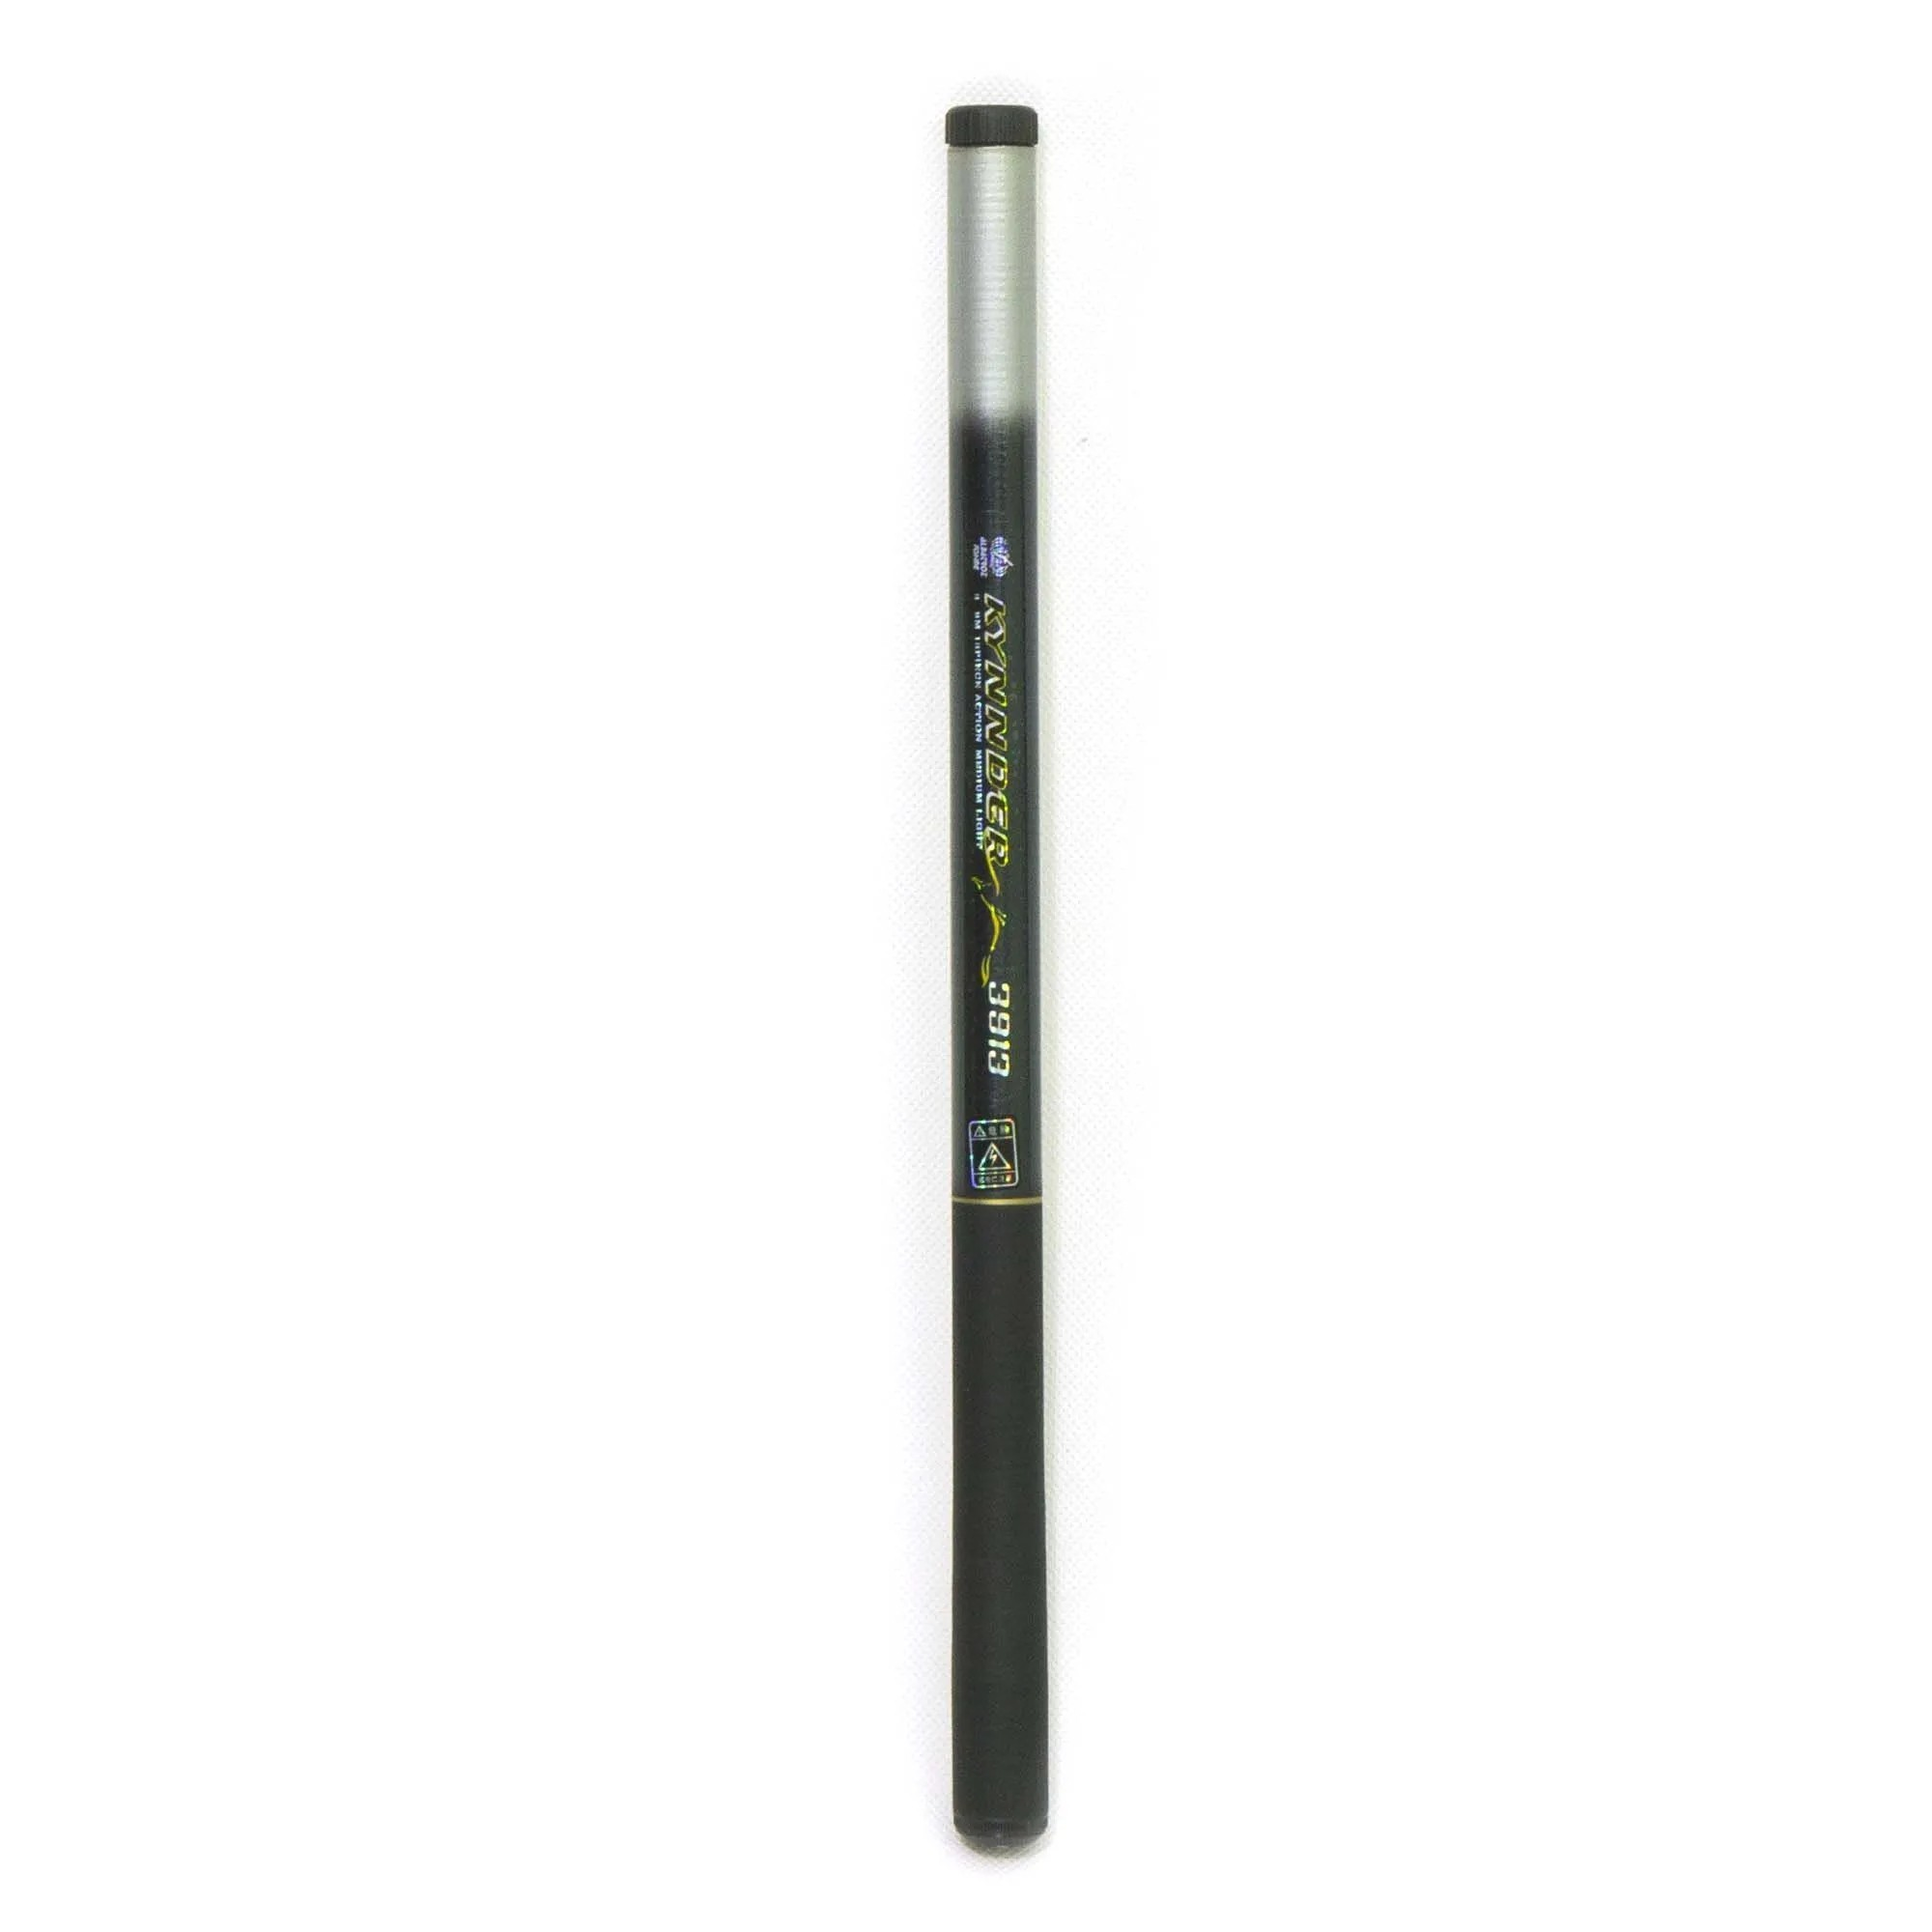 Vara Telescópica uso sem Molinete Kynnder 45% Carbono 2,10m - 7P  - Artpesca